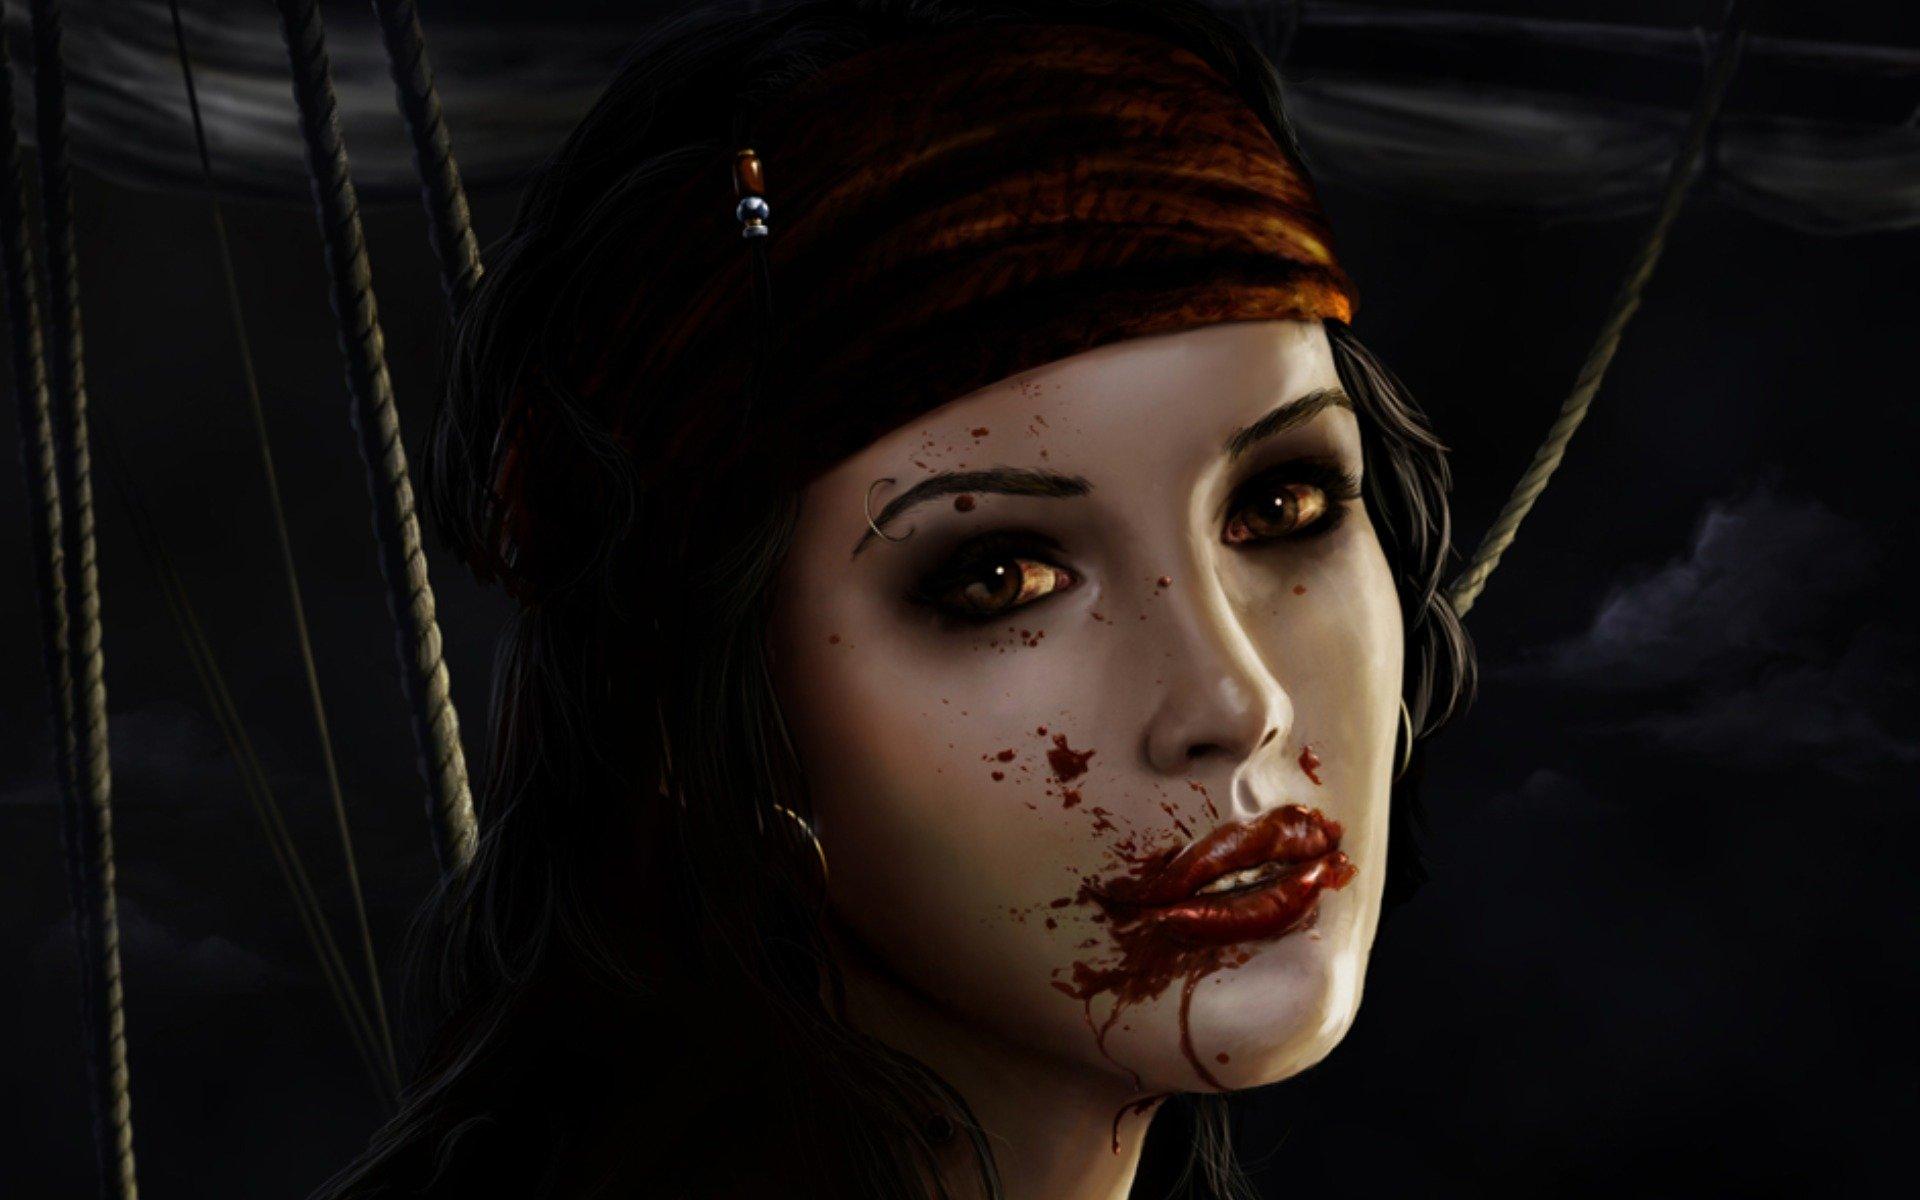 scary vampire wallpaper - photo #43